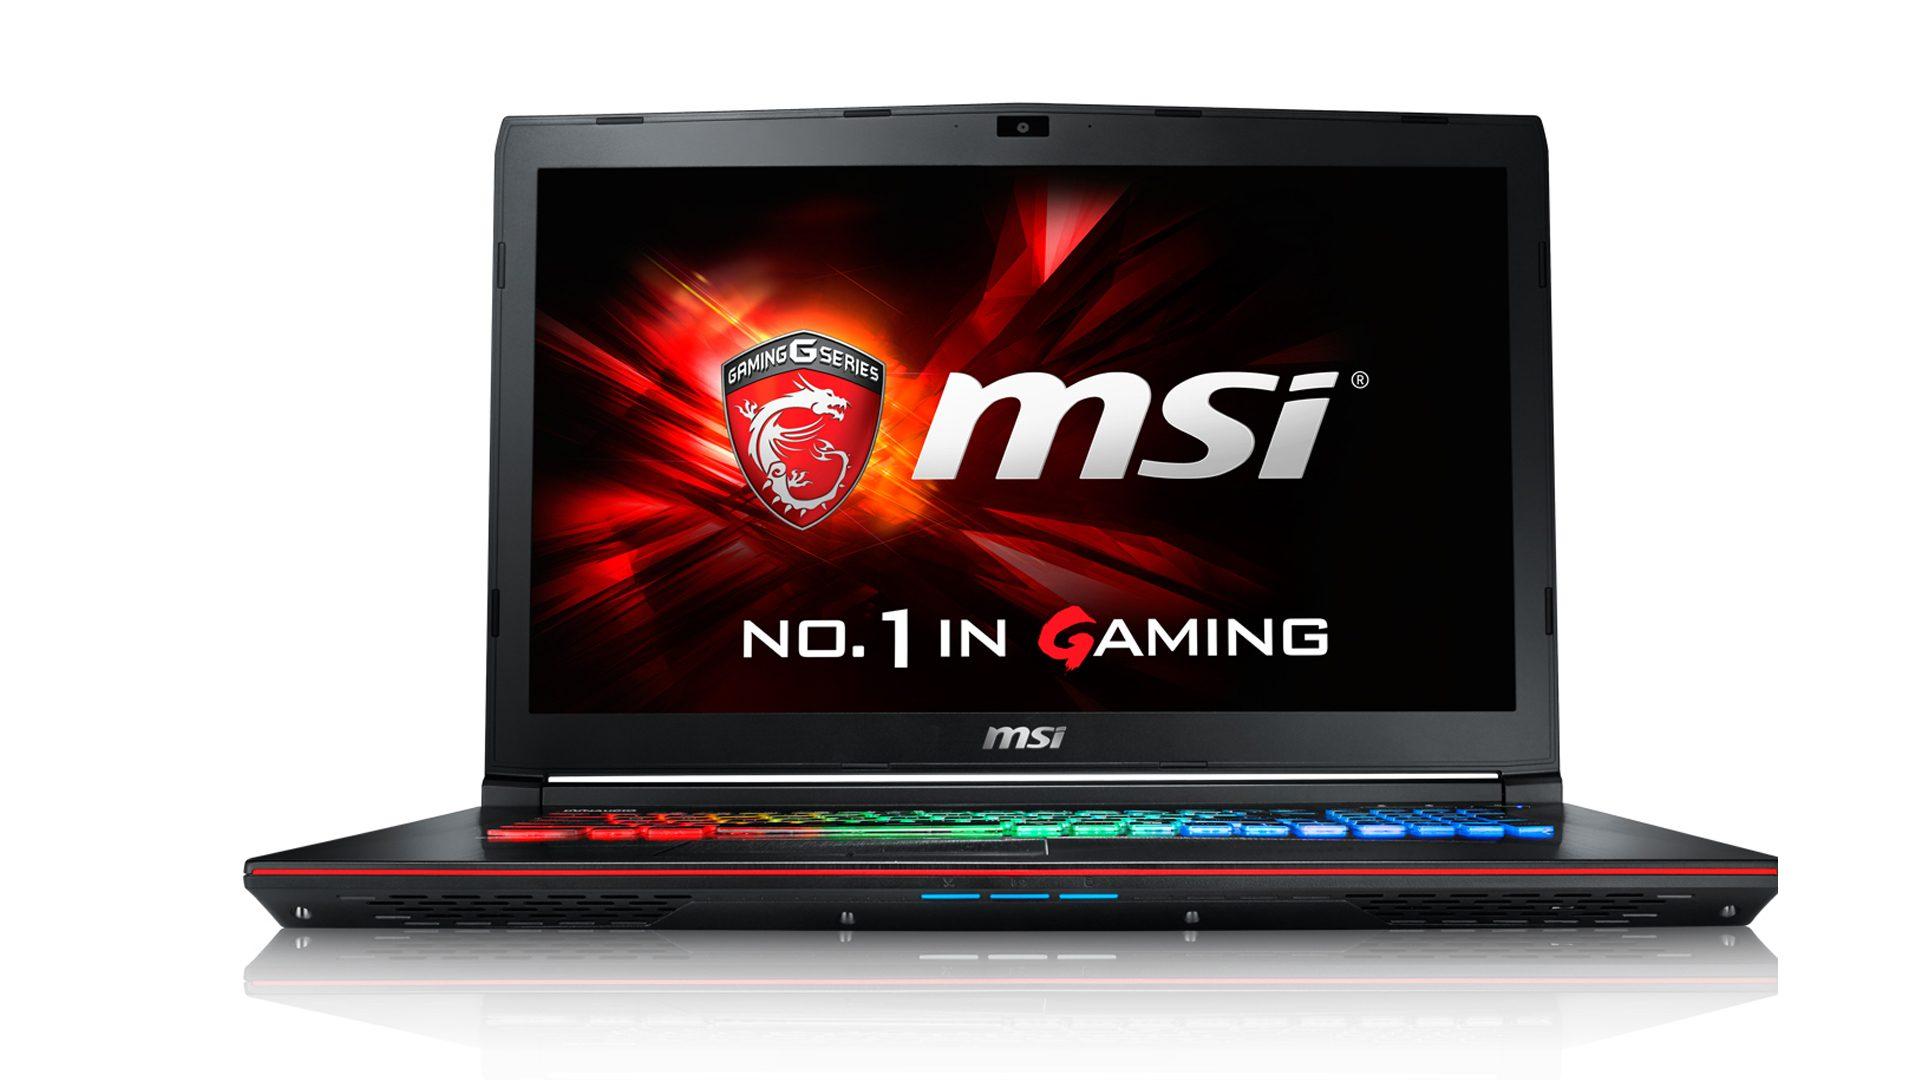 Msi ge72vr 7rf (apache pro) - gaming notebook i7-7700hq+hm175/12gb ddr4 ram/1tb hdd + 128gb ssd/nvidia geforce gtx1060 6gb ddr5 graphics/win10/17.3 inch fhd /black